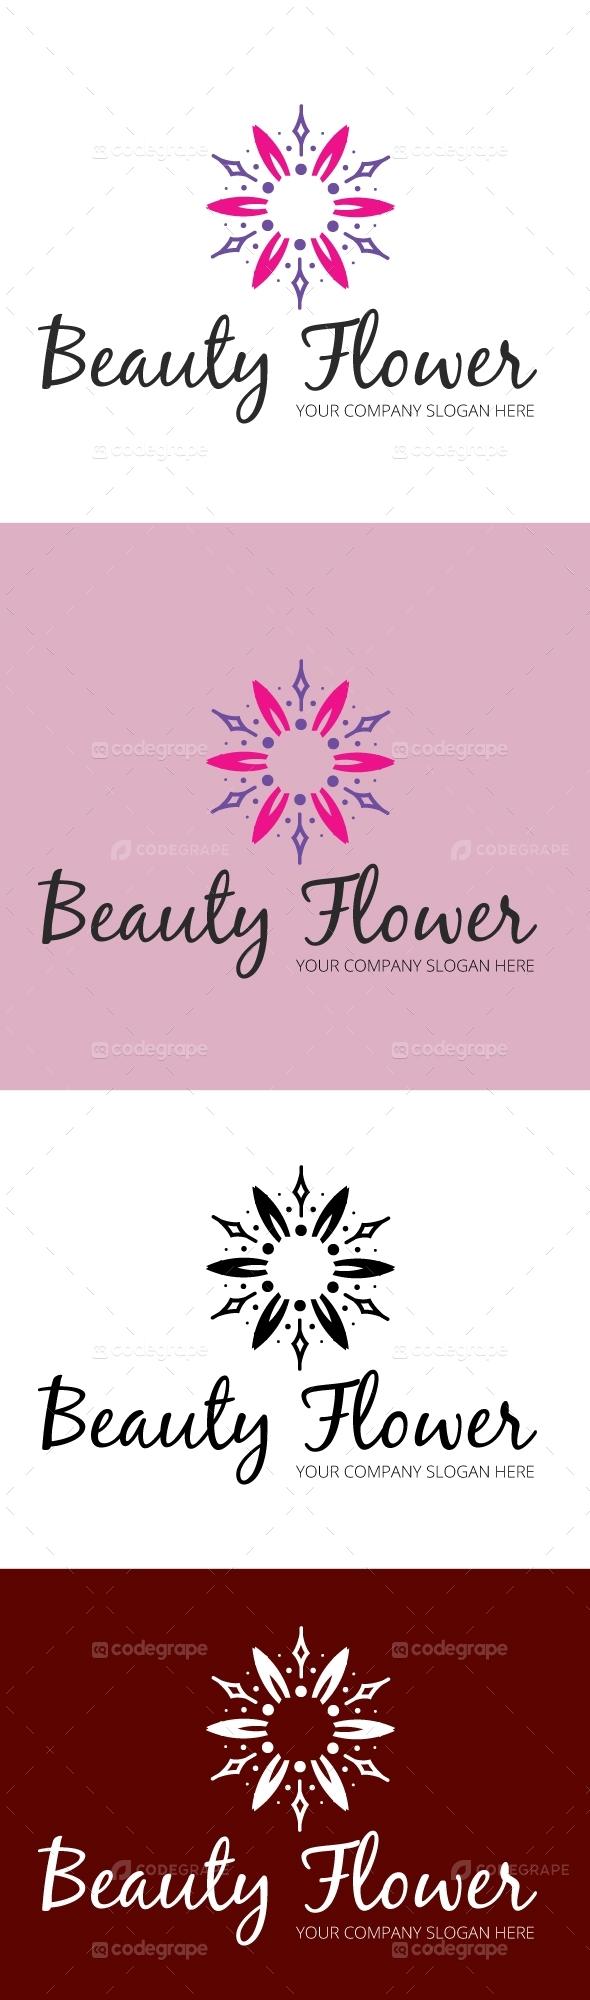 Beauty Flower Logo Template